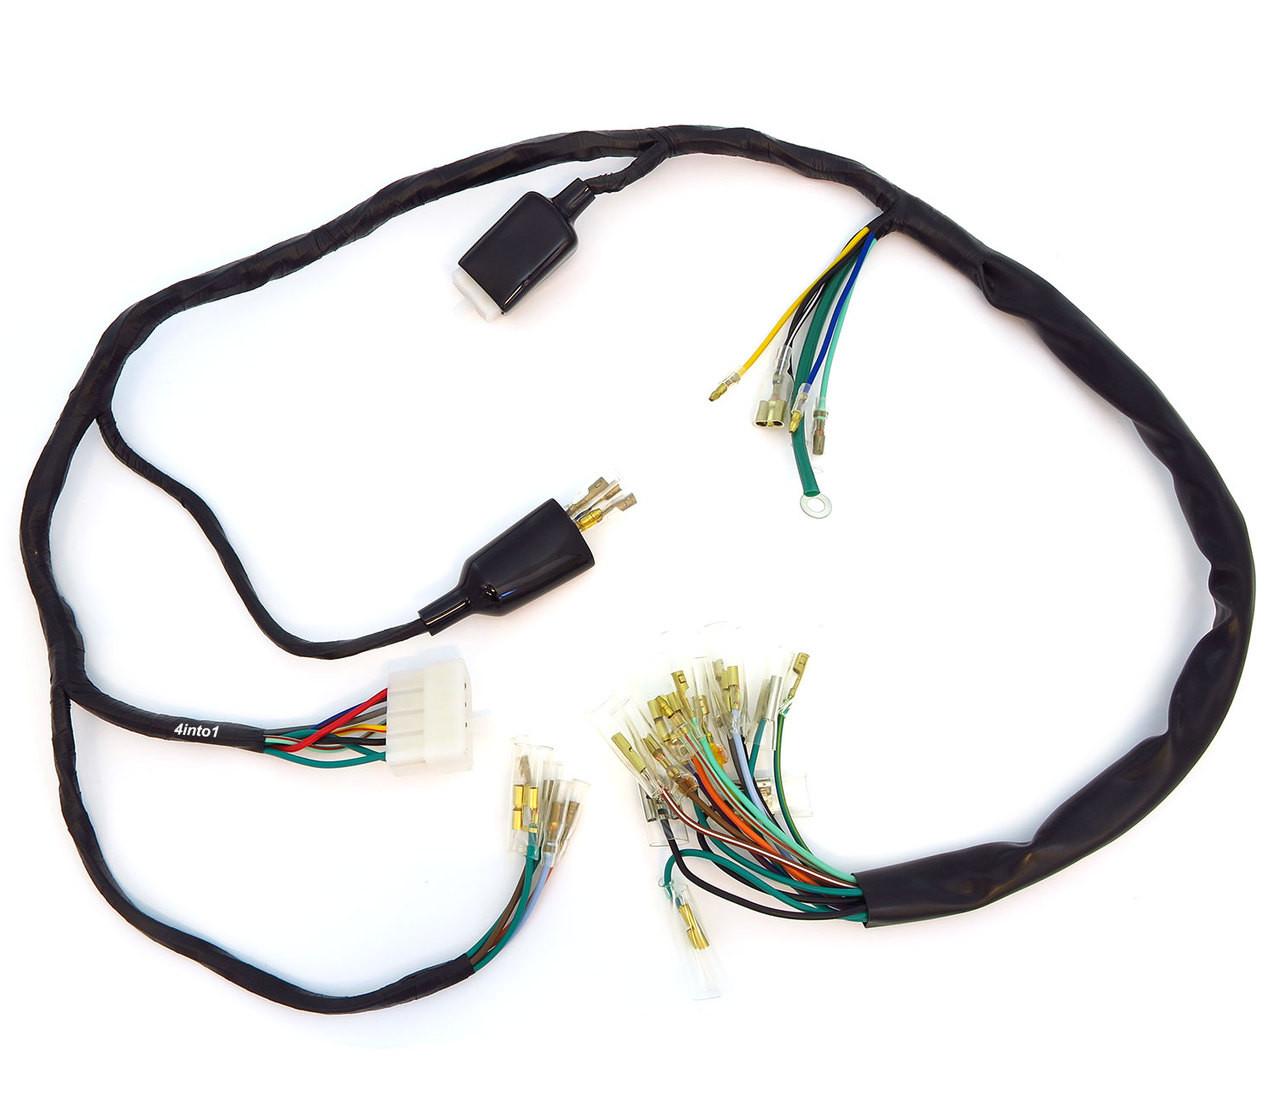 small resolution of main wiring harness 32100 323 040 honda cb500k 1972 1973main wiring harness 10